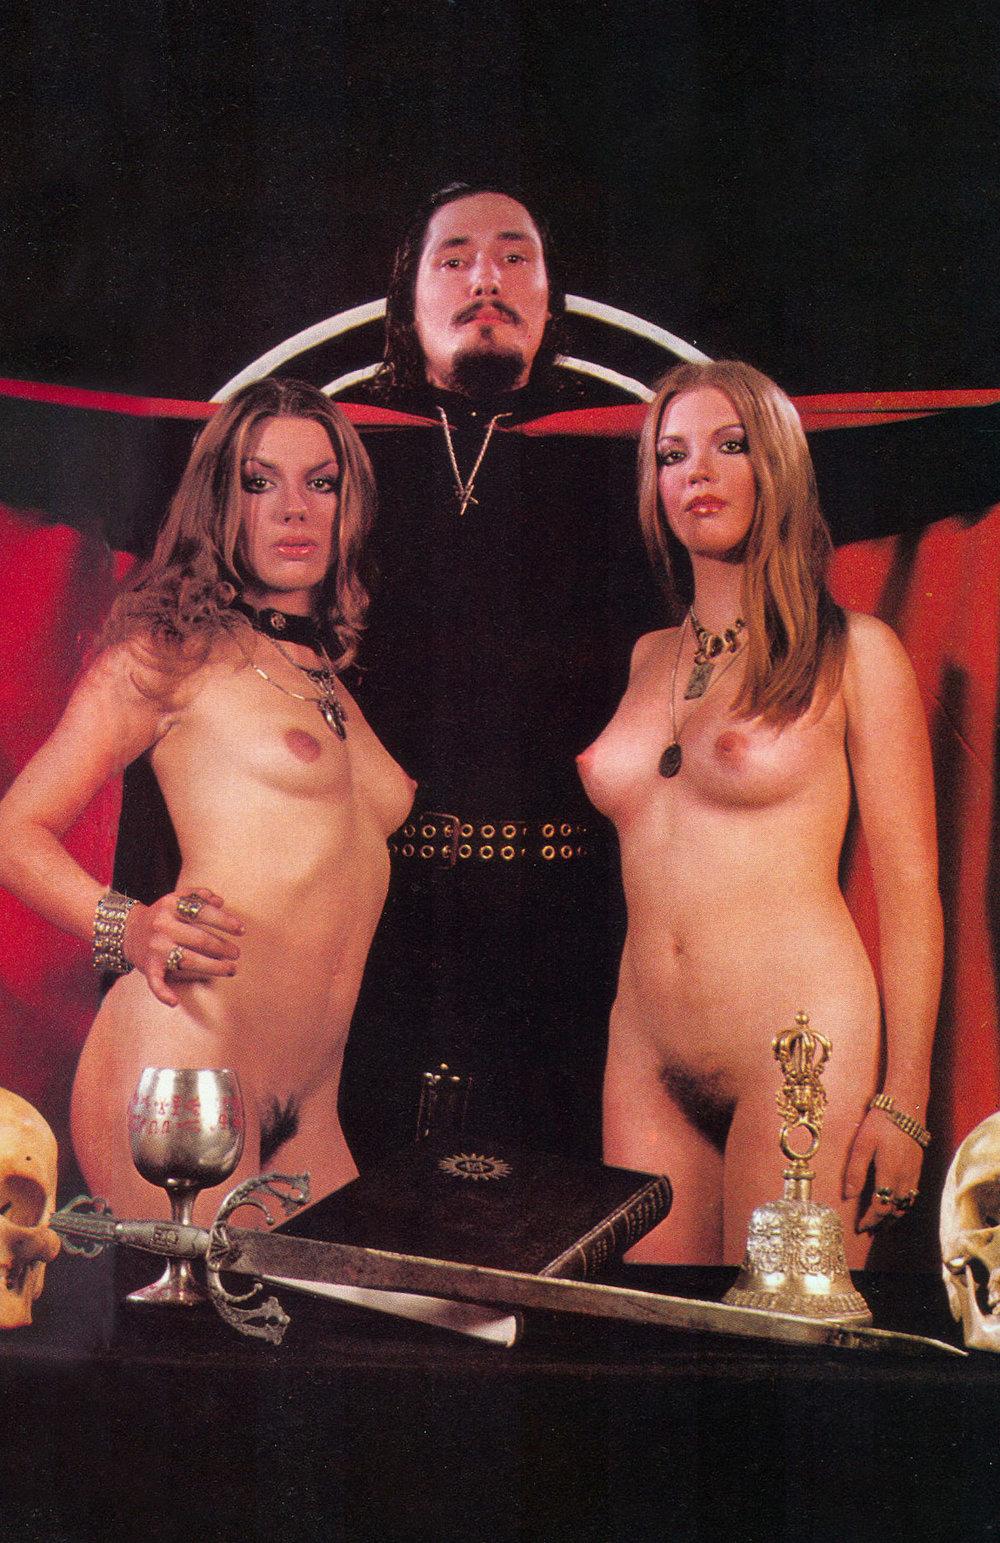 Anton Lavey of the Churchof Satan in Cheri magazine,1978.